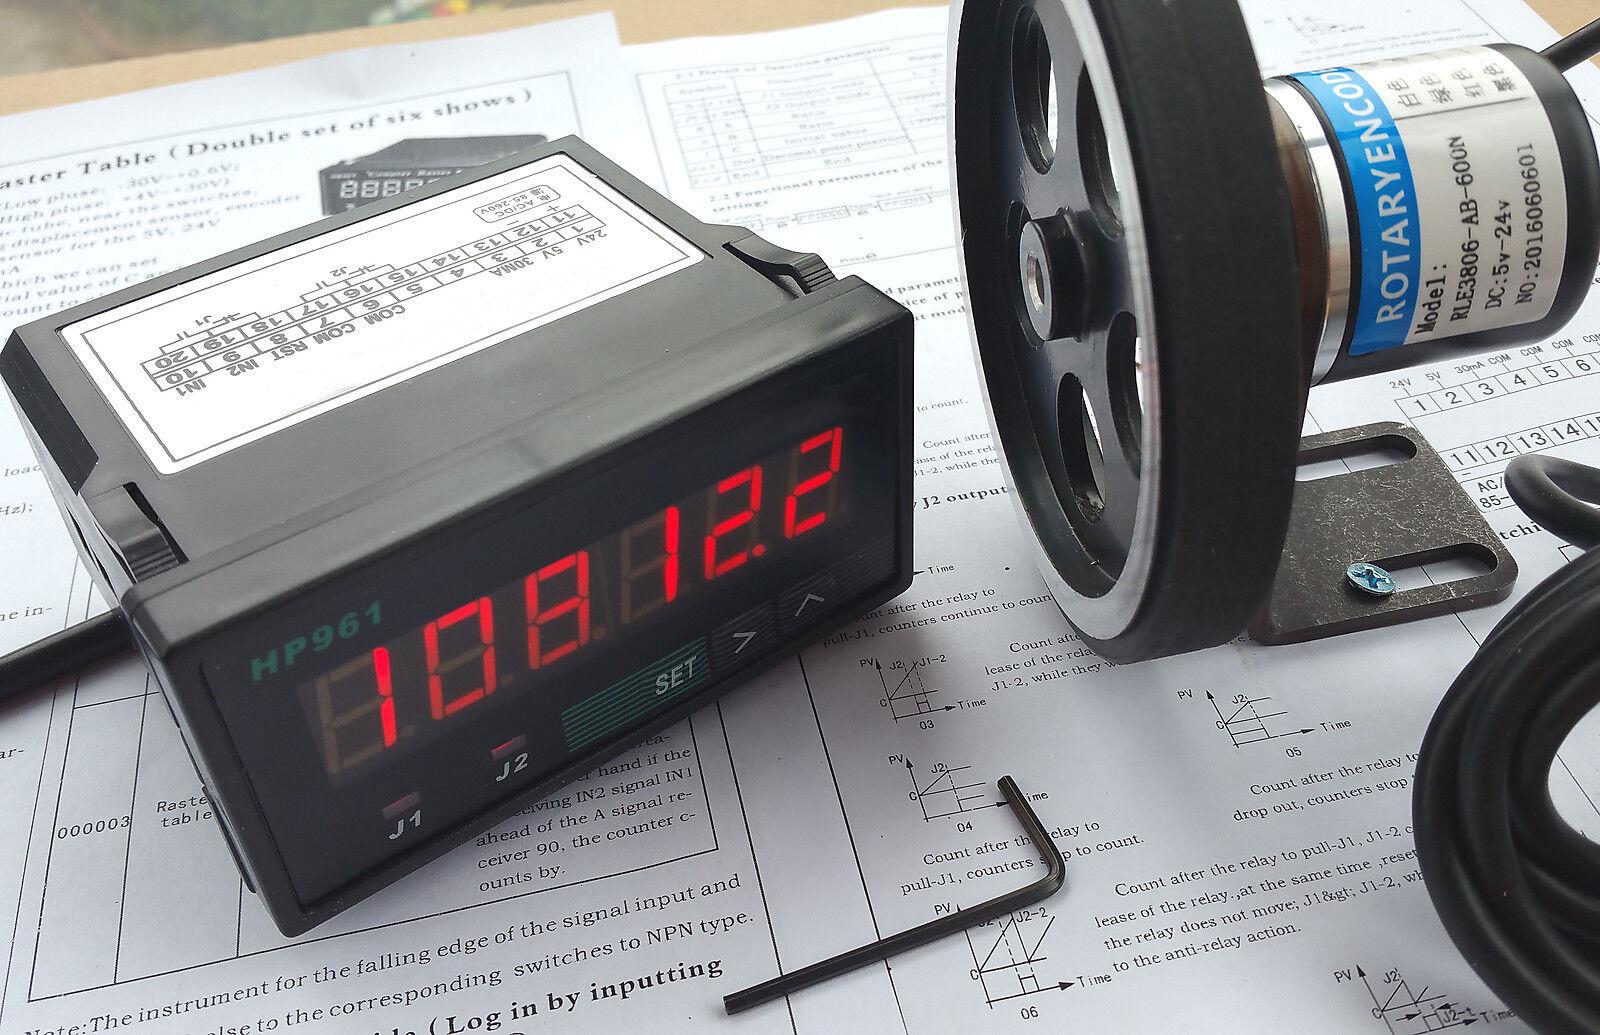 High Precision Length Measure Counter Tool Kits 0.1 m Resolution + 300mm Wheel